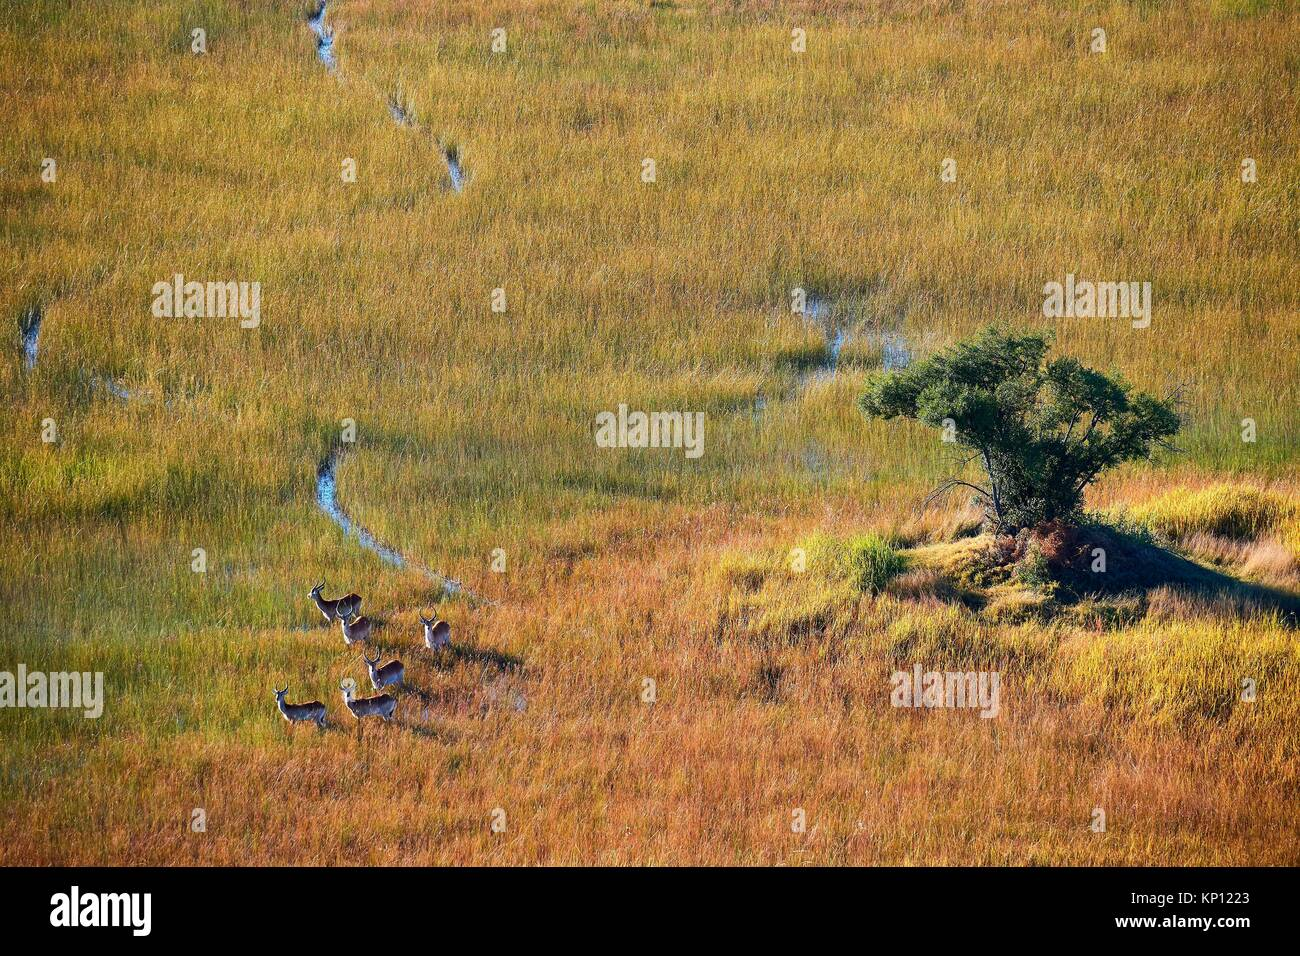 Aerial view of Lechwe (Kobus leche) crossing wetlands, Okavango Delta, Botswana, Africa. - Stock Image